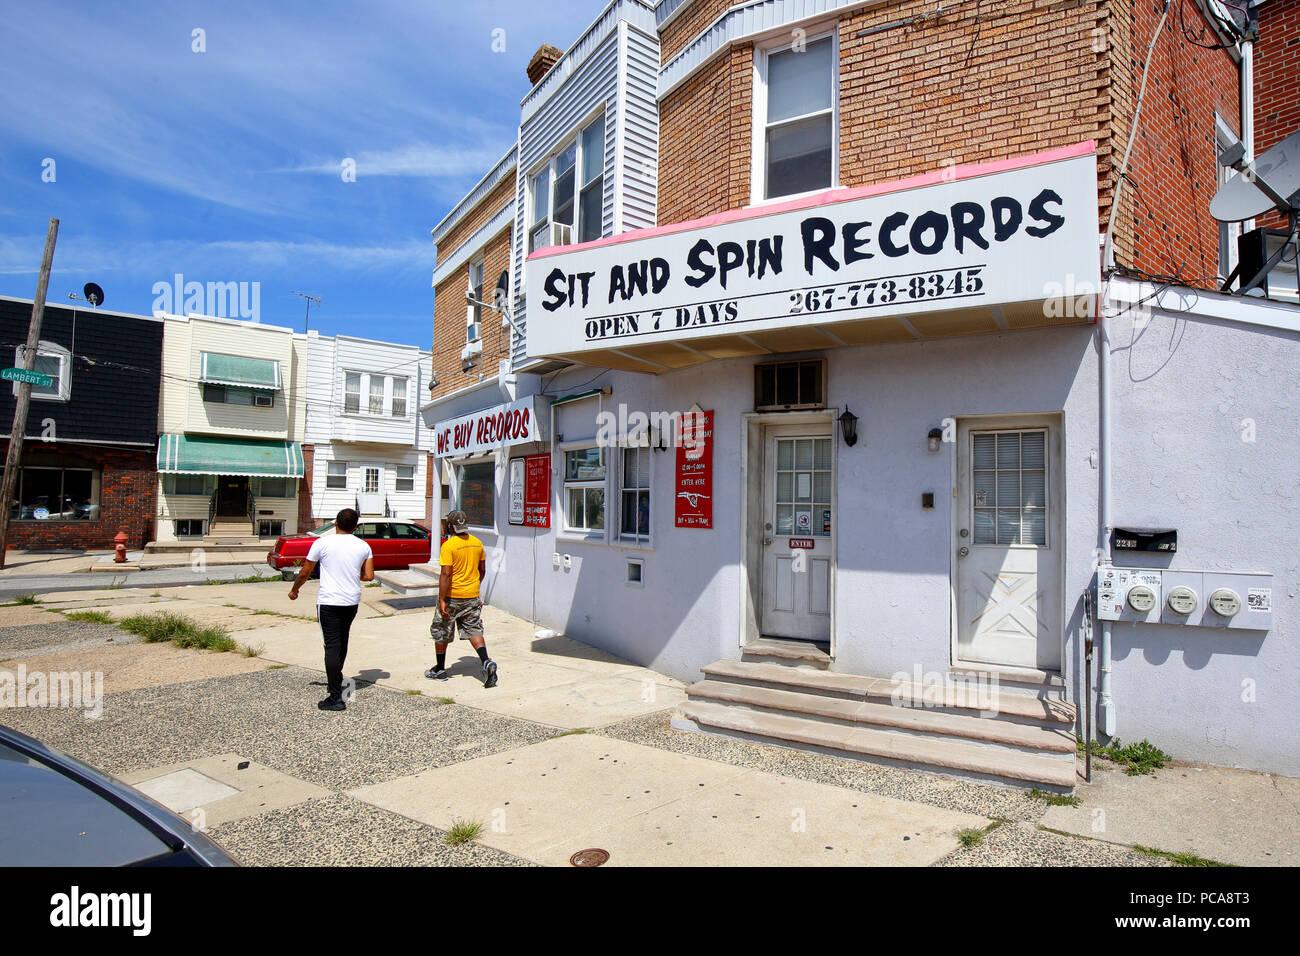 Sitzen und Spin Records, 2243 S Lambert St, Philadelphia, PA Stockbild